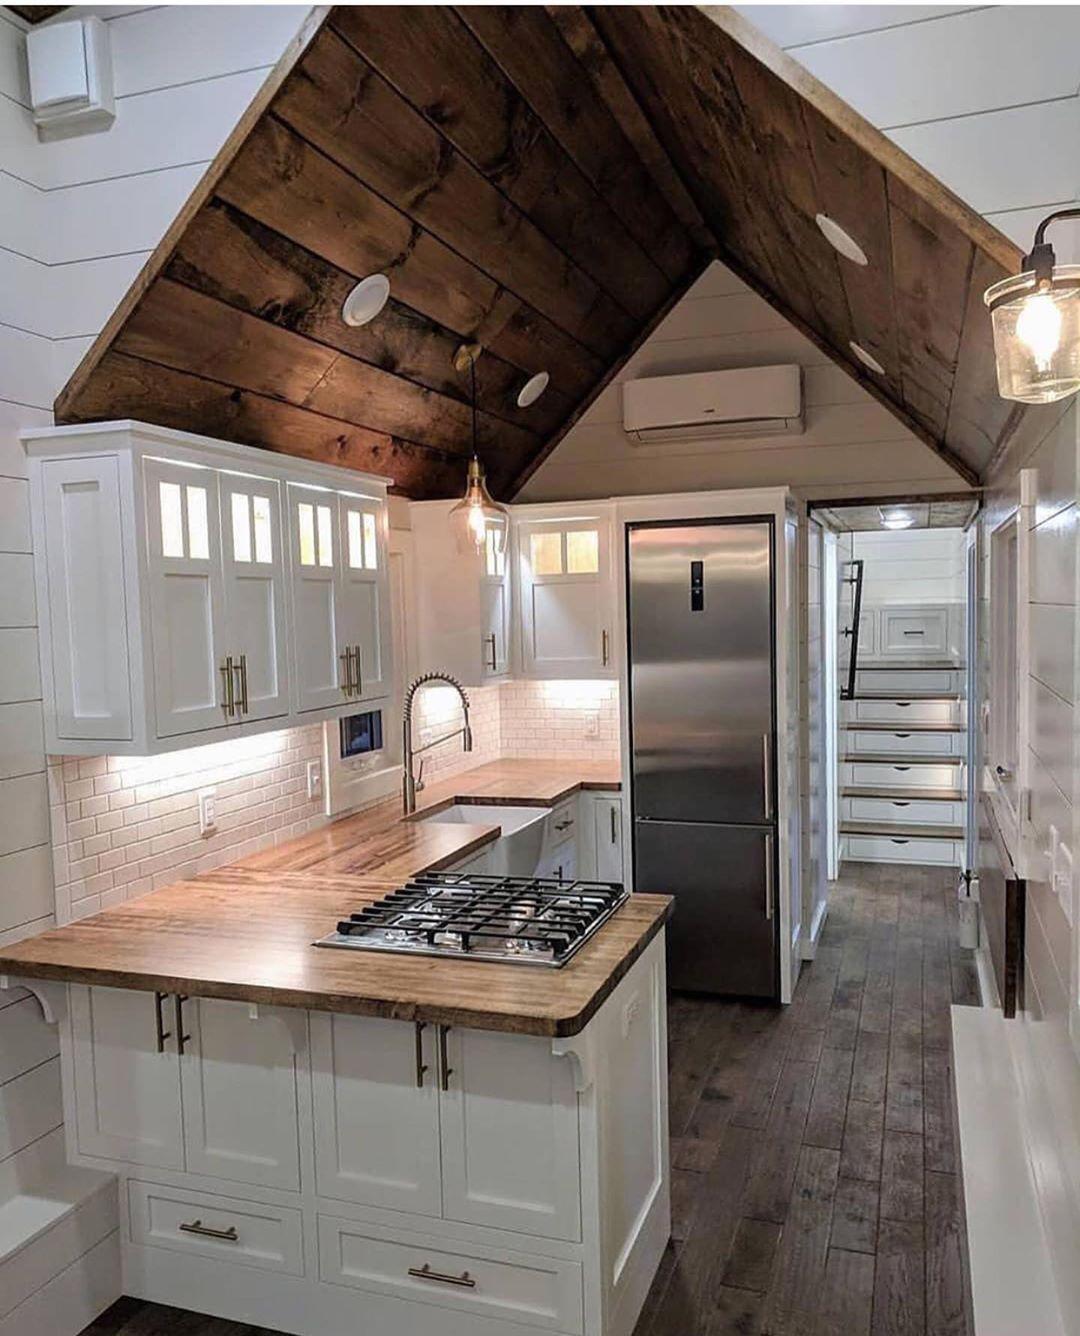 Phenomenal Modern Trends Interior Designs Ideas Tiny House Kitchen Tiny House Interior Design Tiny House Hunters